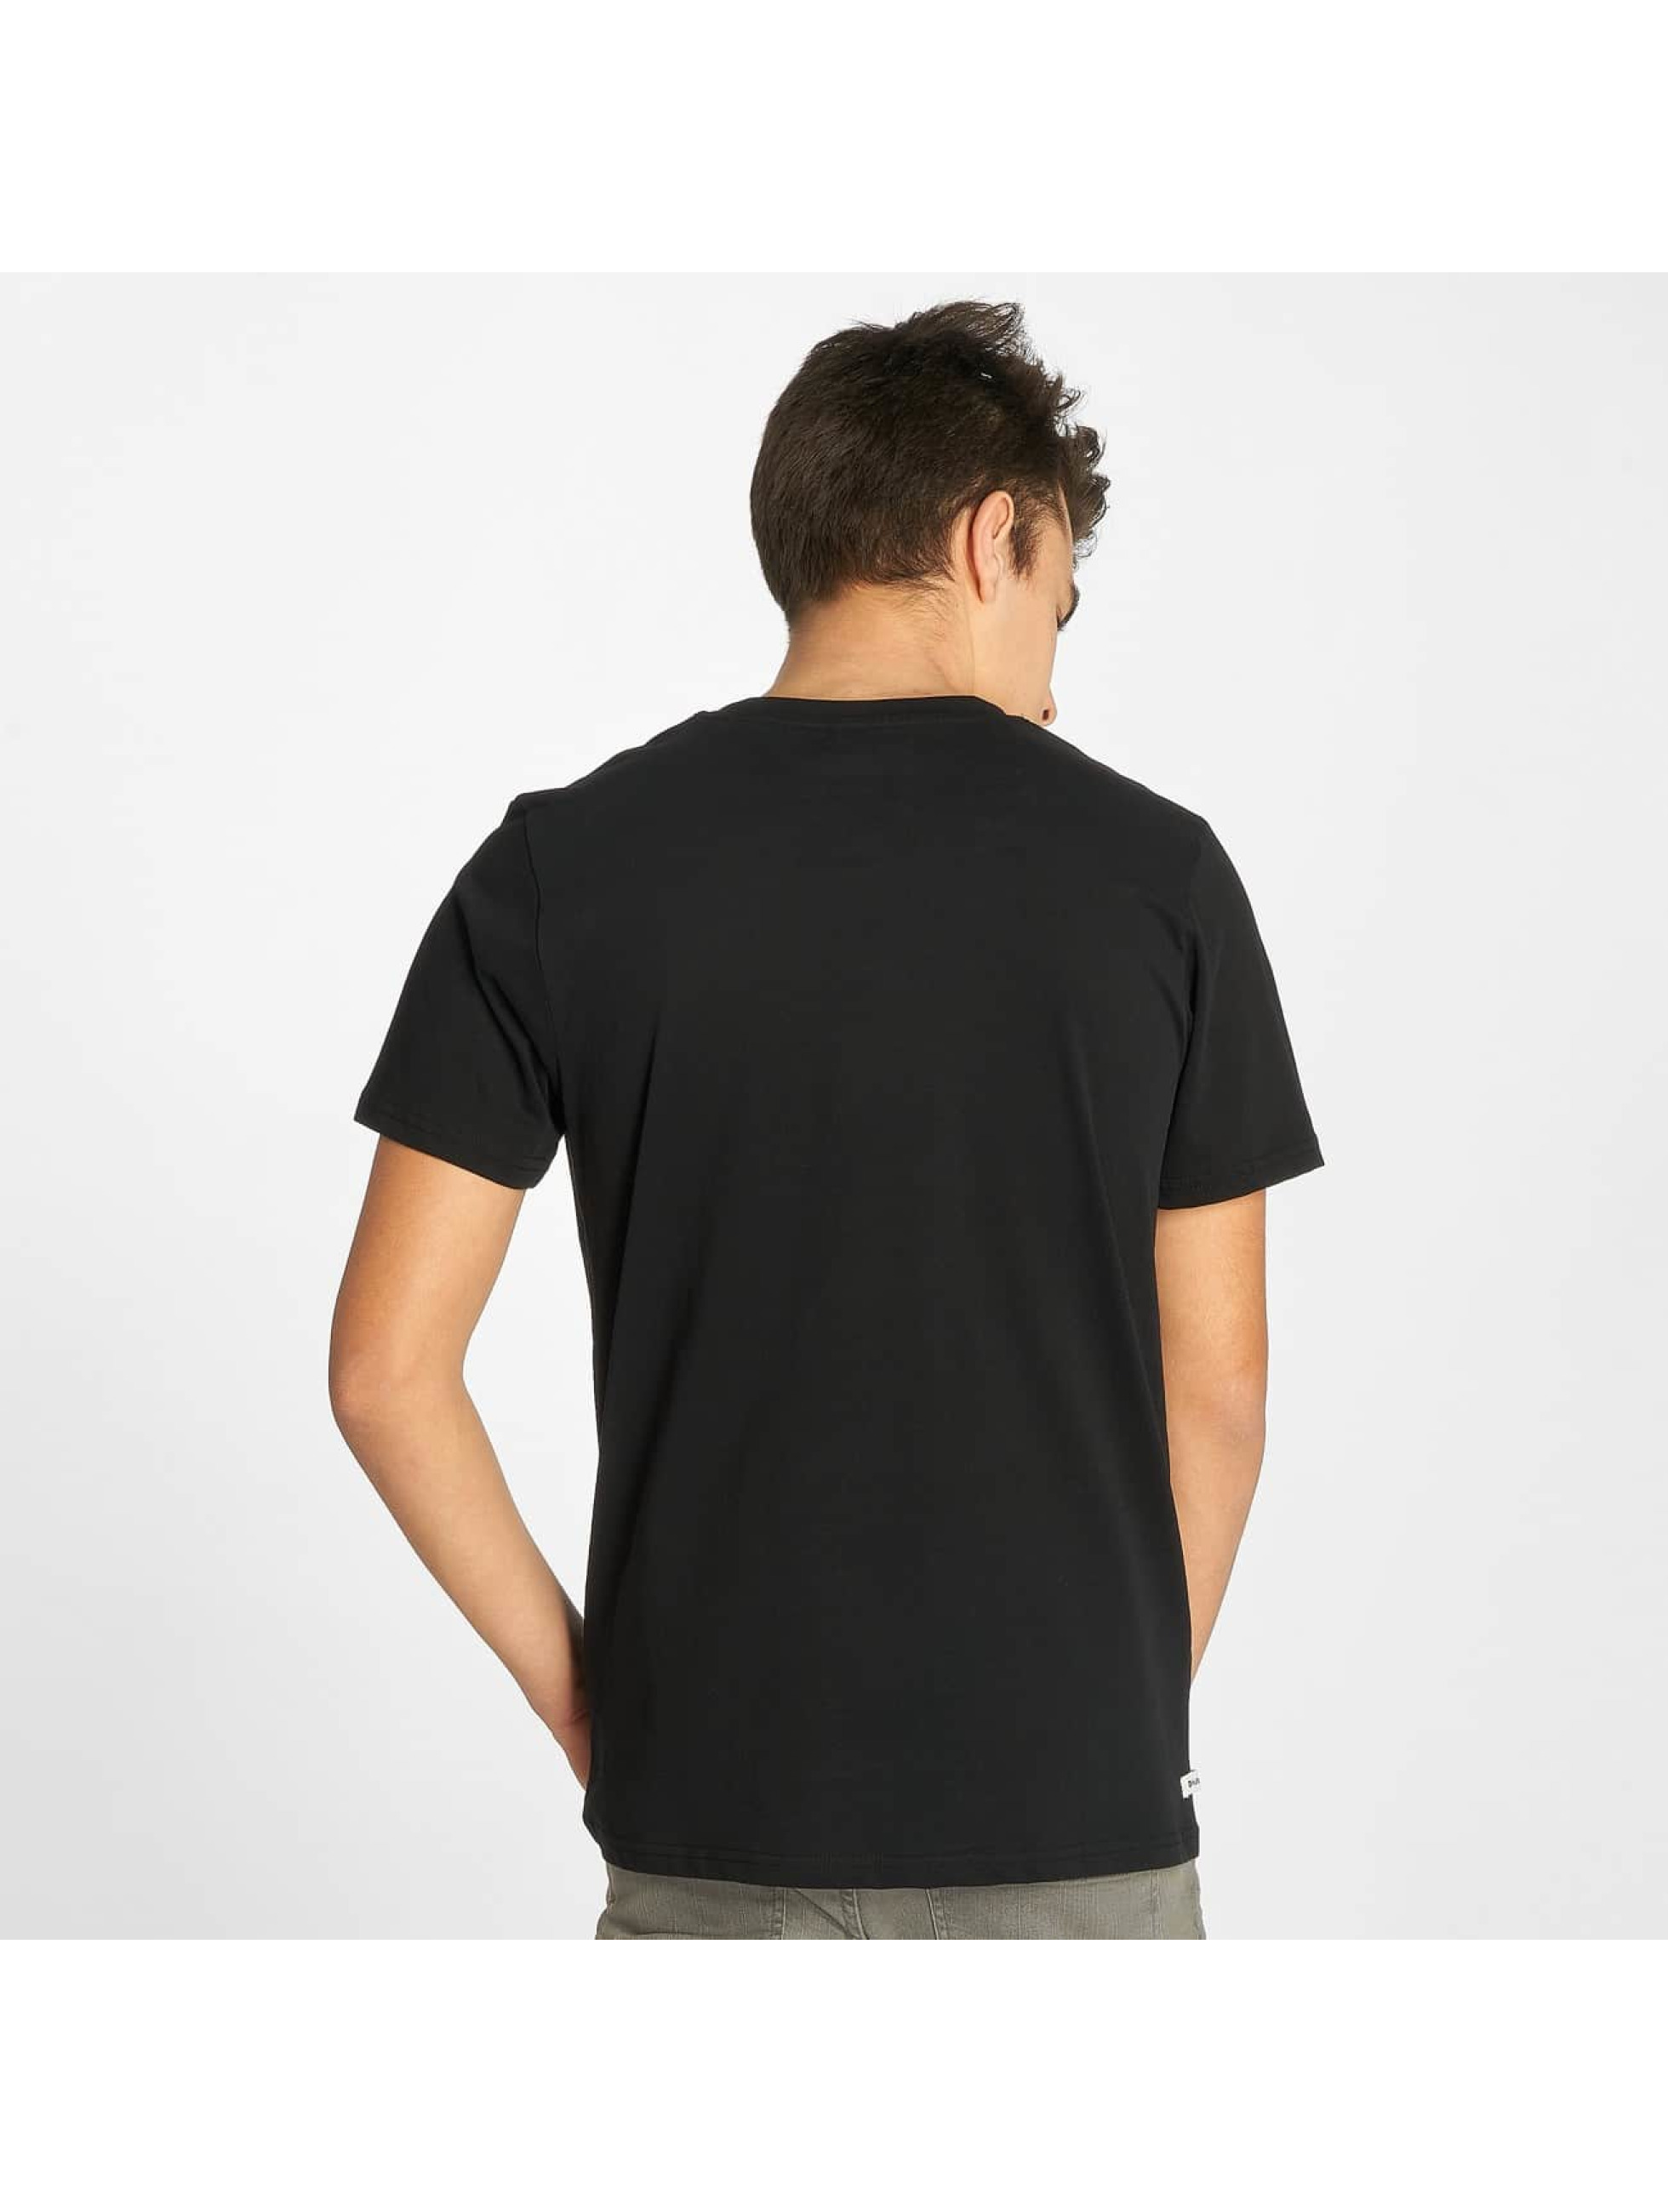 Kulte T-paidat Discovery musta